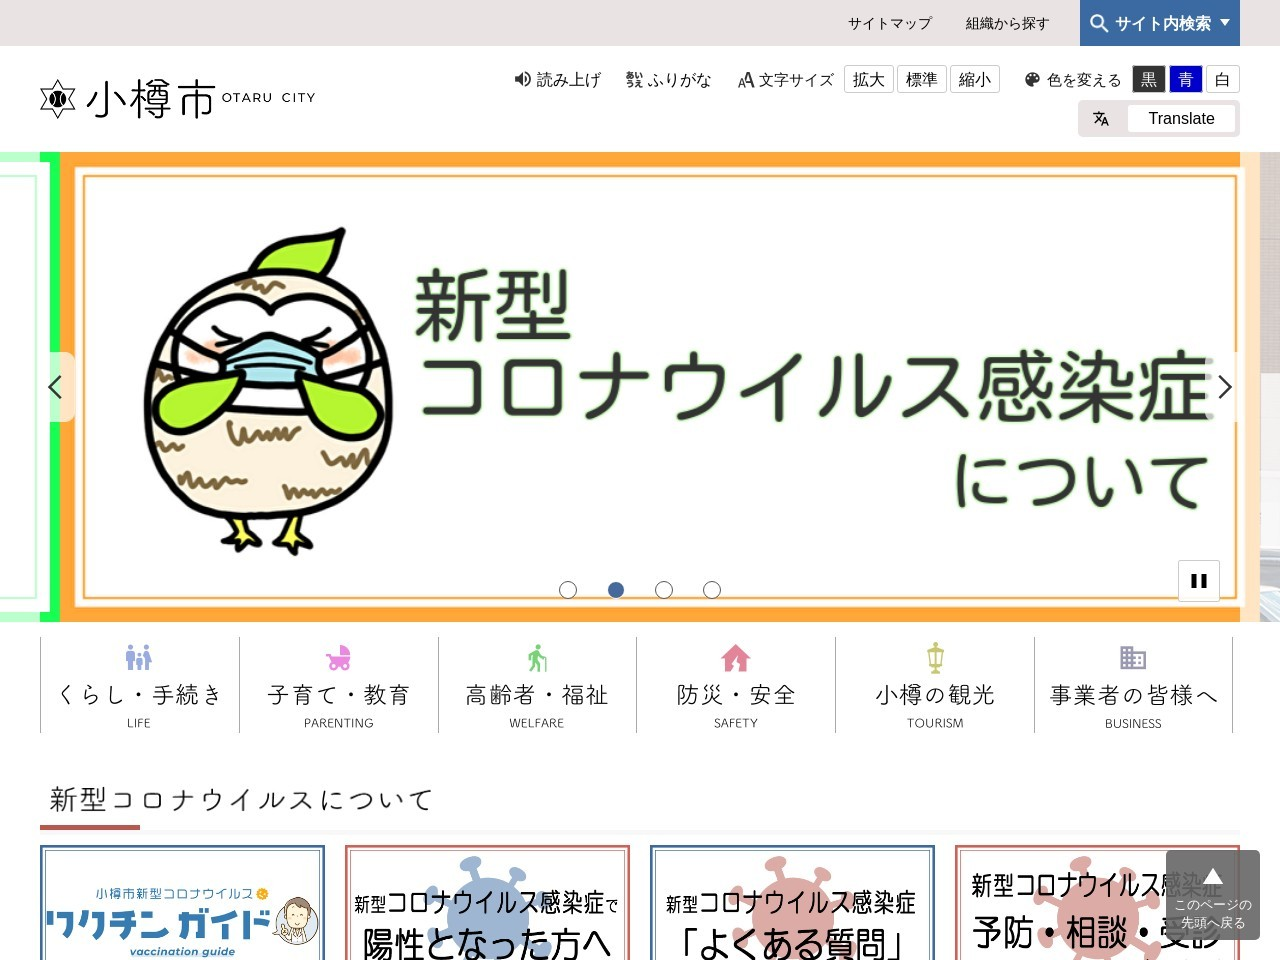 https://www.city.otaru.lg.jp/simin/kokuho_nenkin/zei/nouzei/nouzei_koubai.html